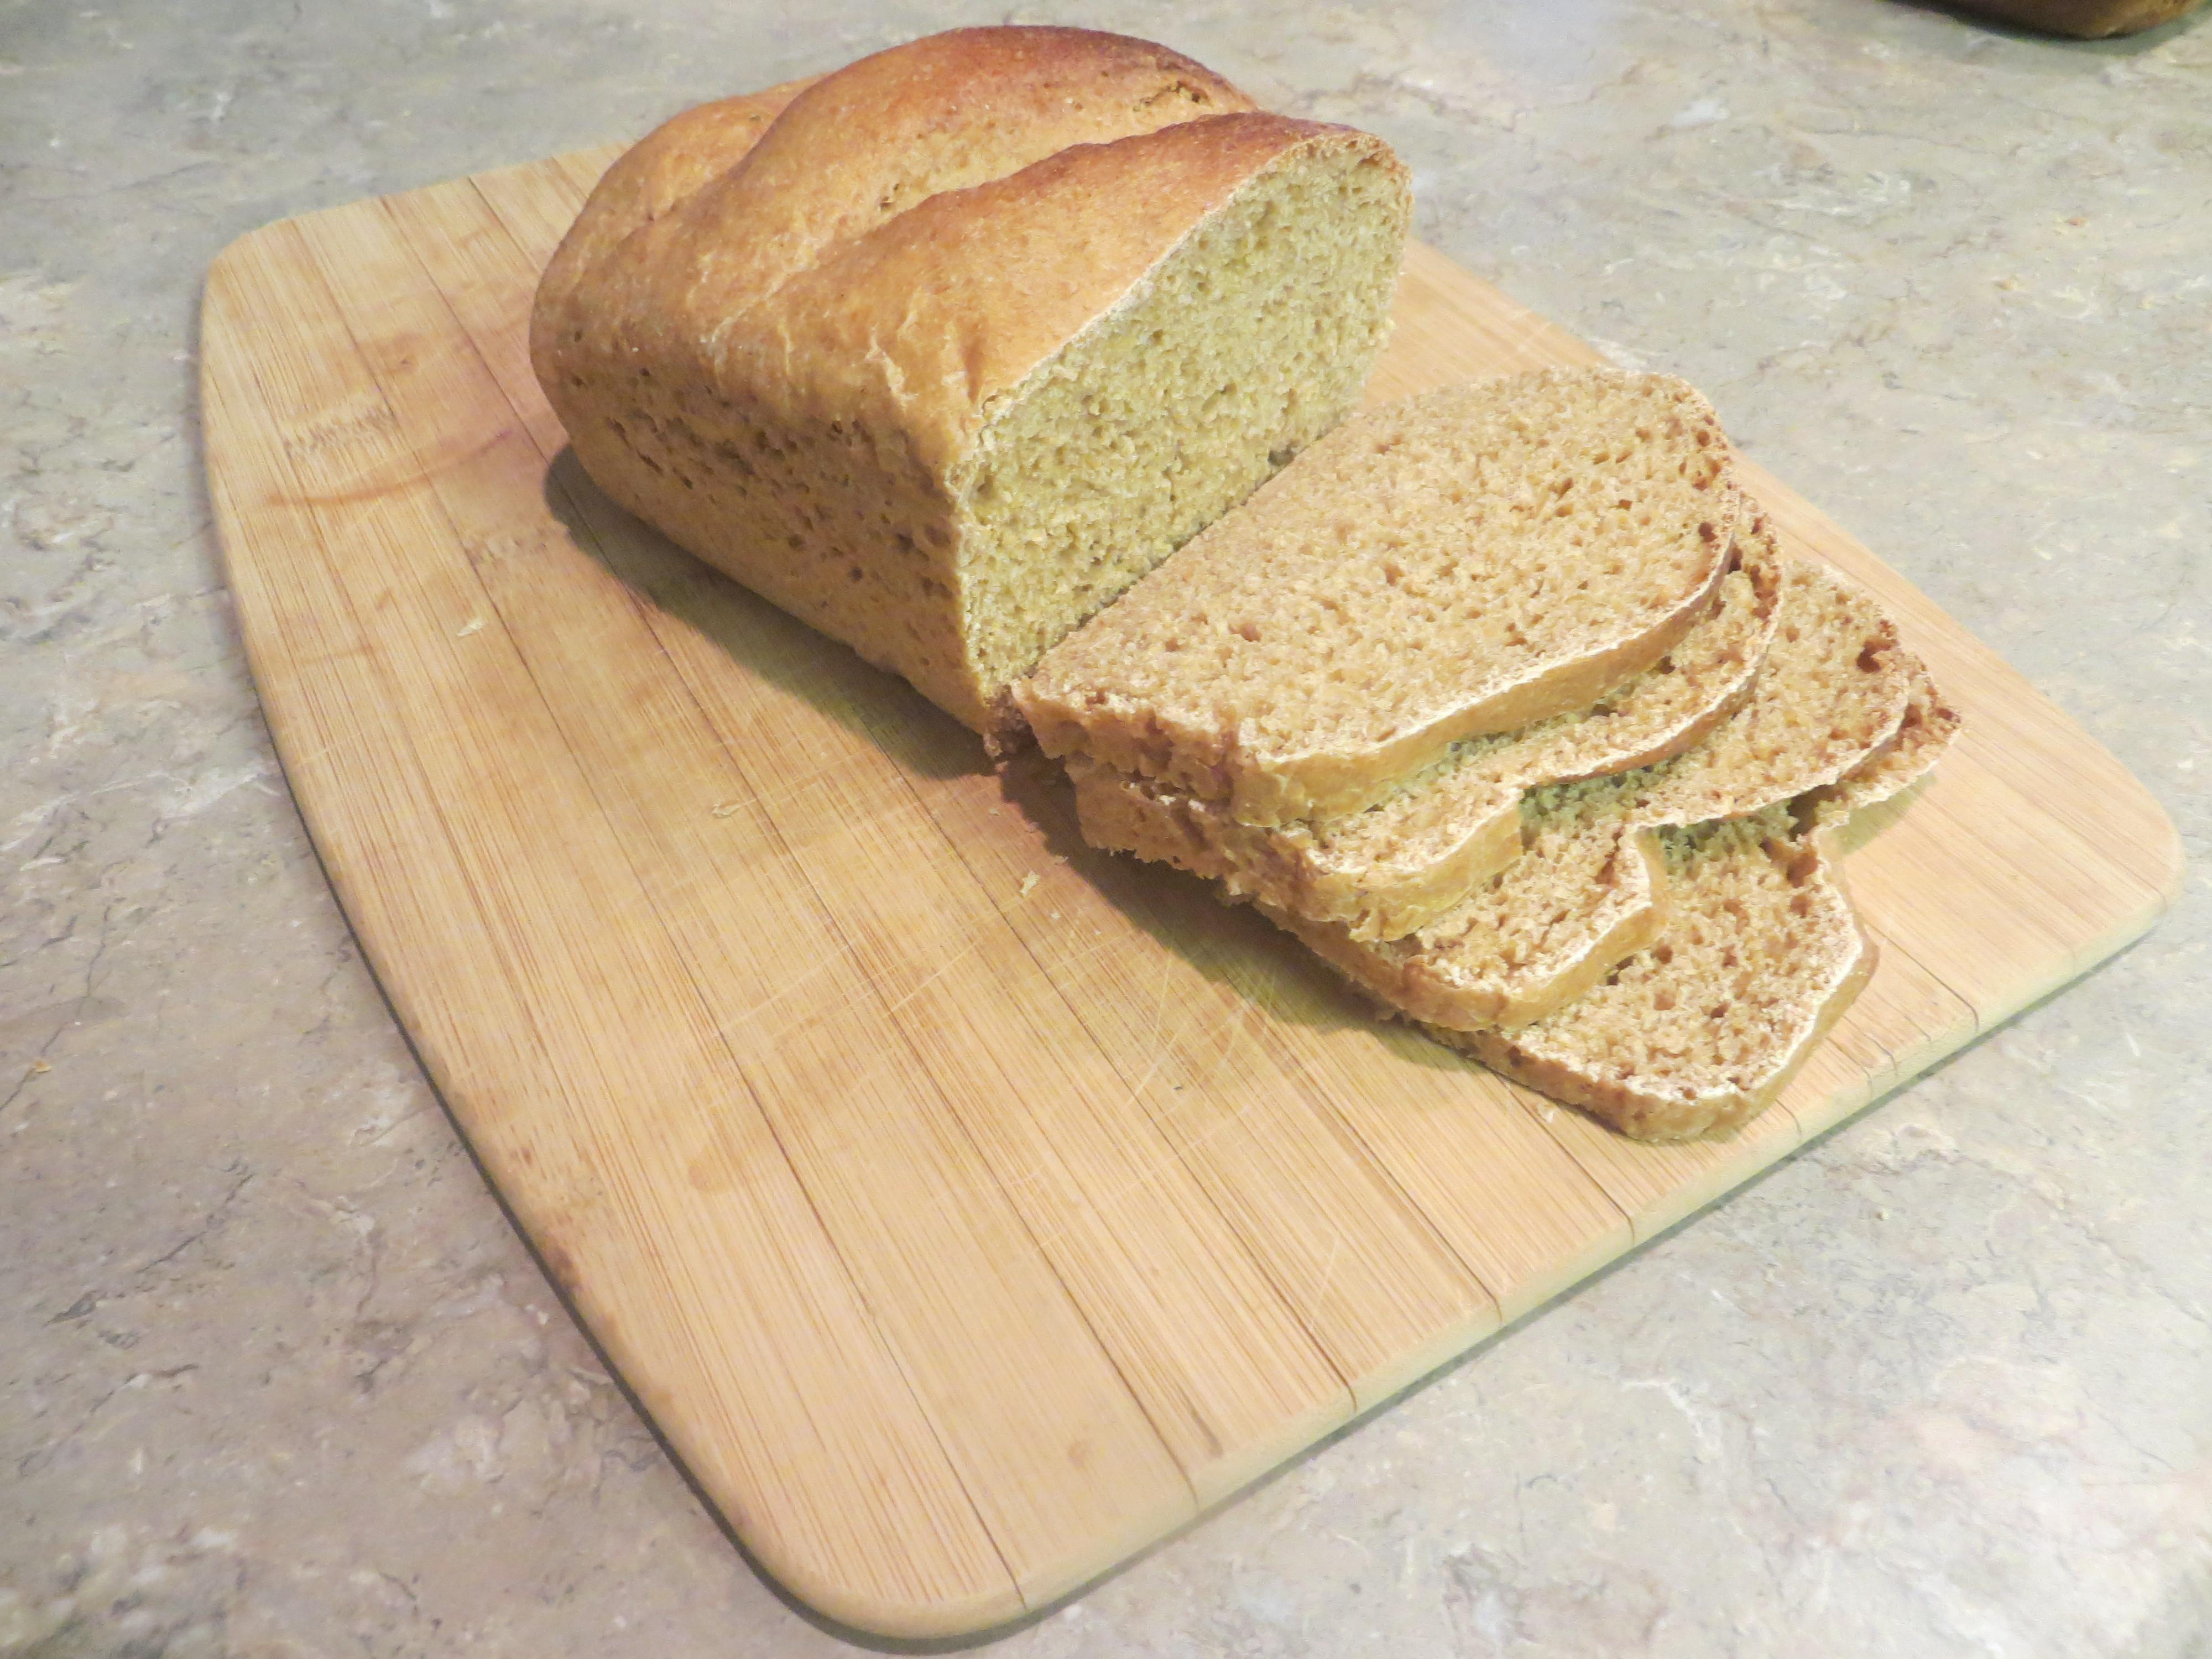 Einkorn Bread Recipe  Naturally Leavened Sourdough Einkorn Bread